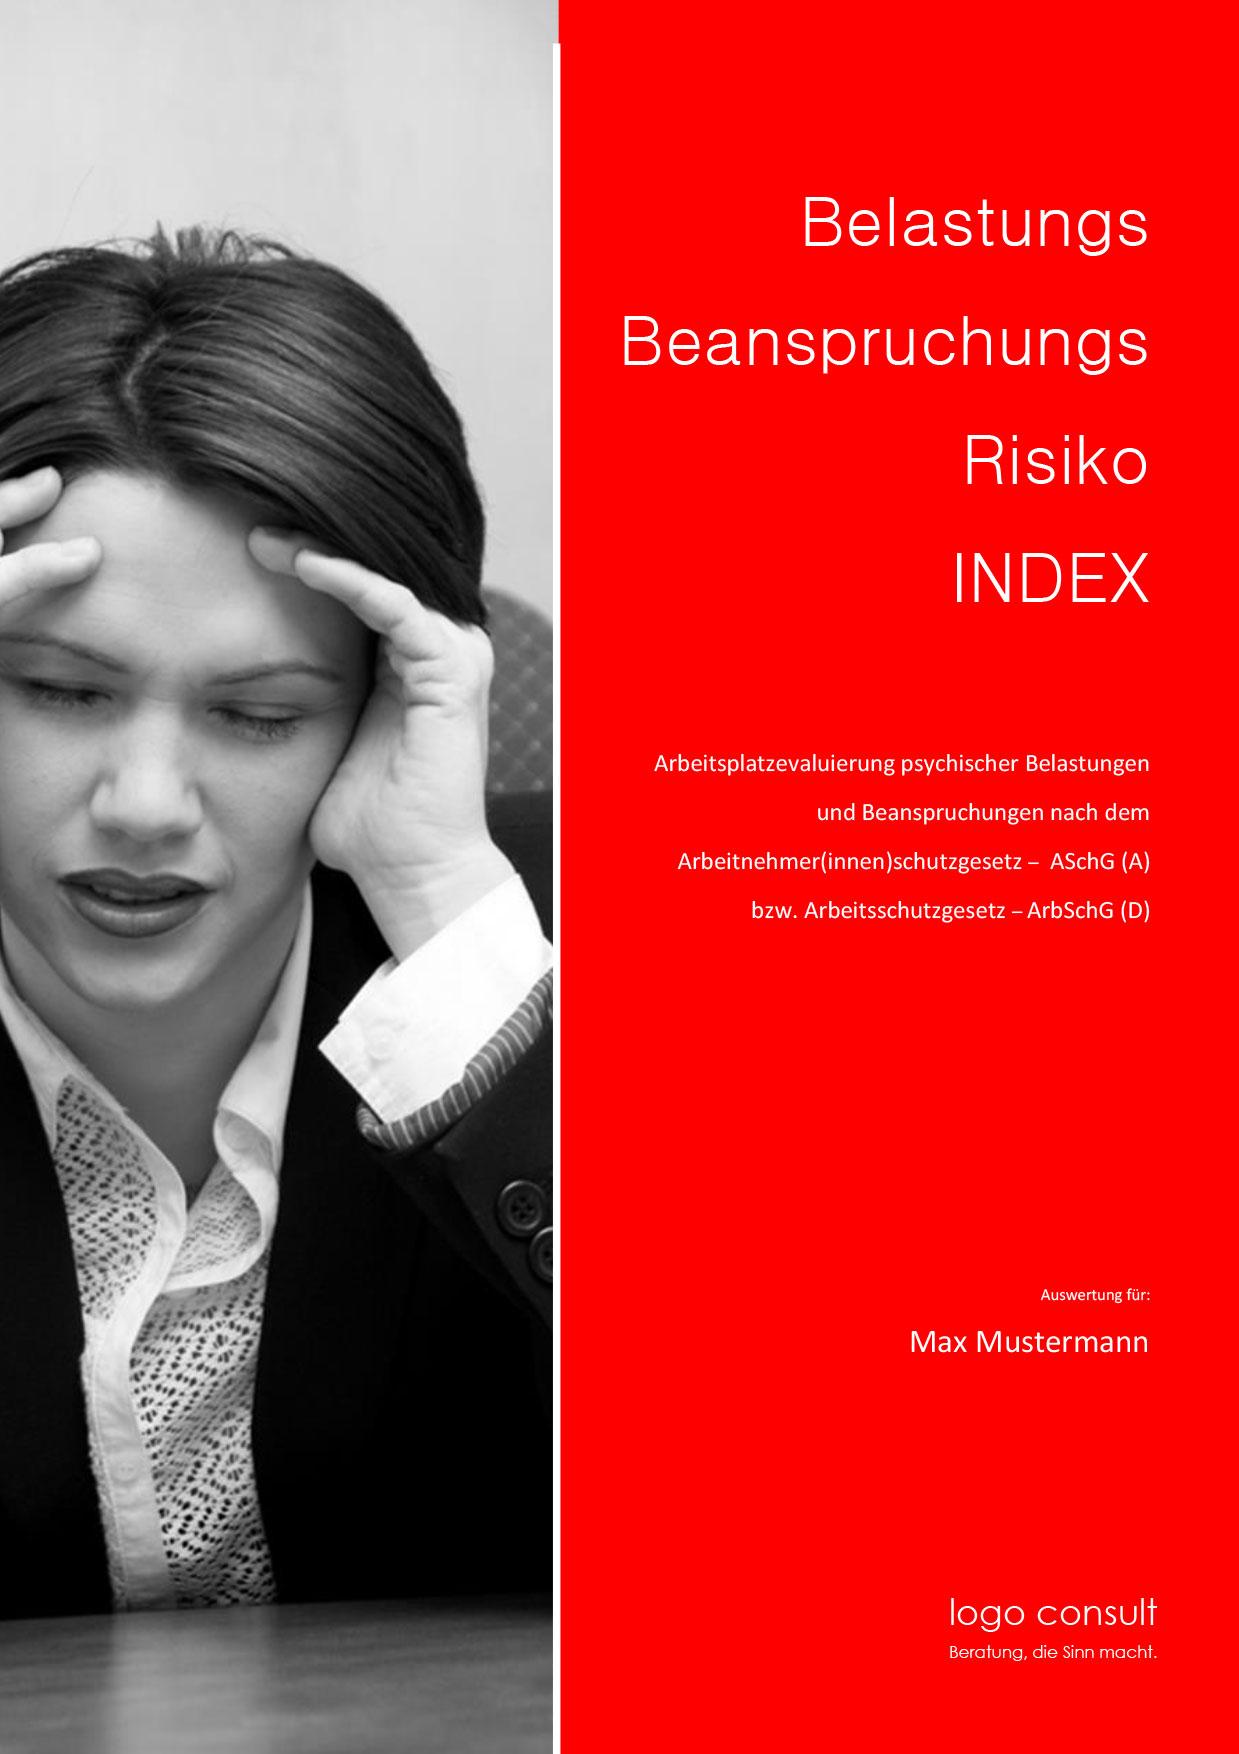 BBRI 1.0 – Belastungs – Beanspruchungs – Risiko – Index